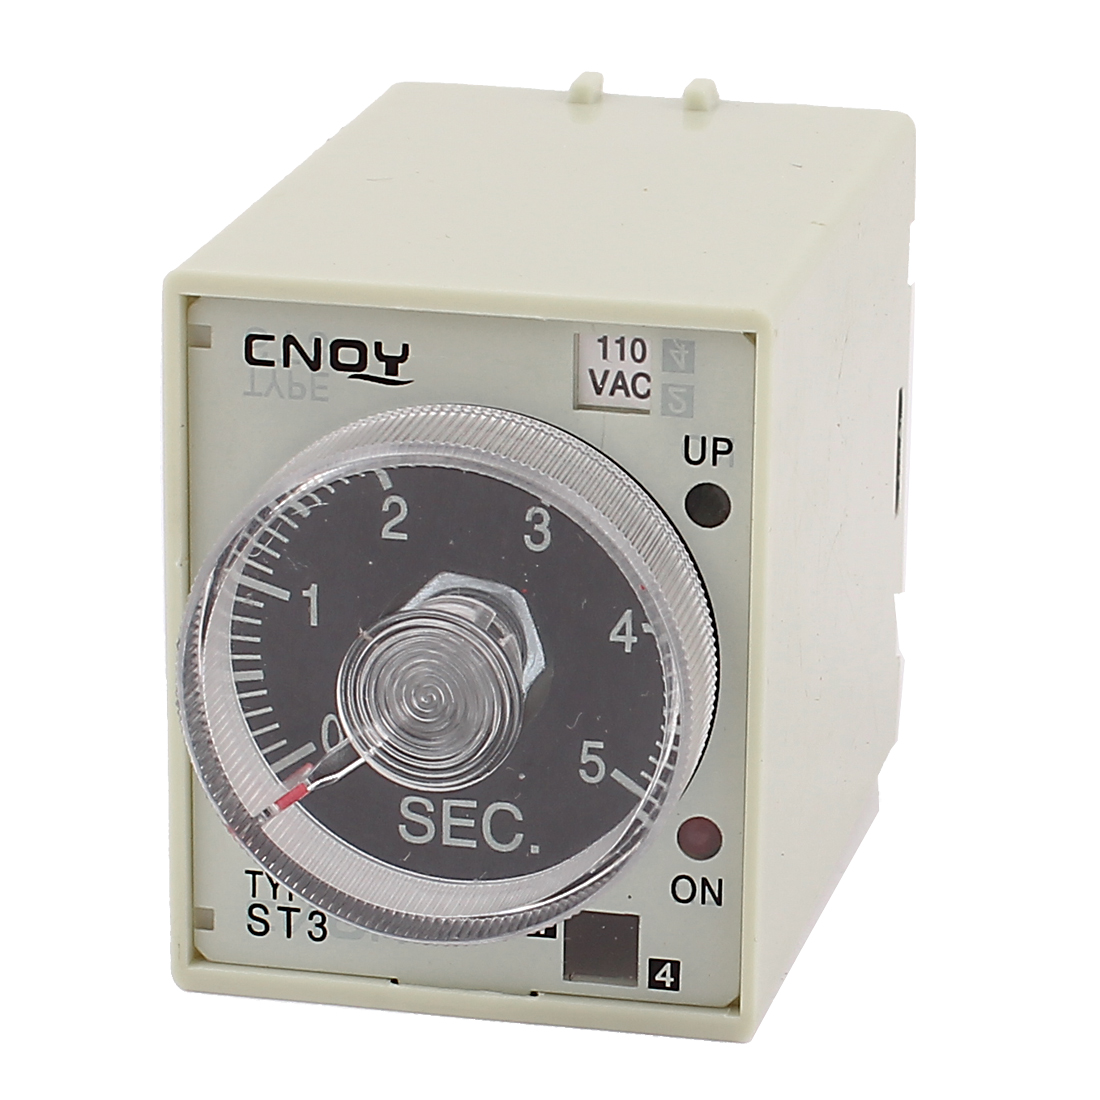 ST3 Model AC 110V SPDT 0-5 Seconds Delay Power On Timer Time Relay